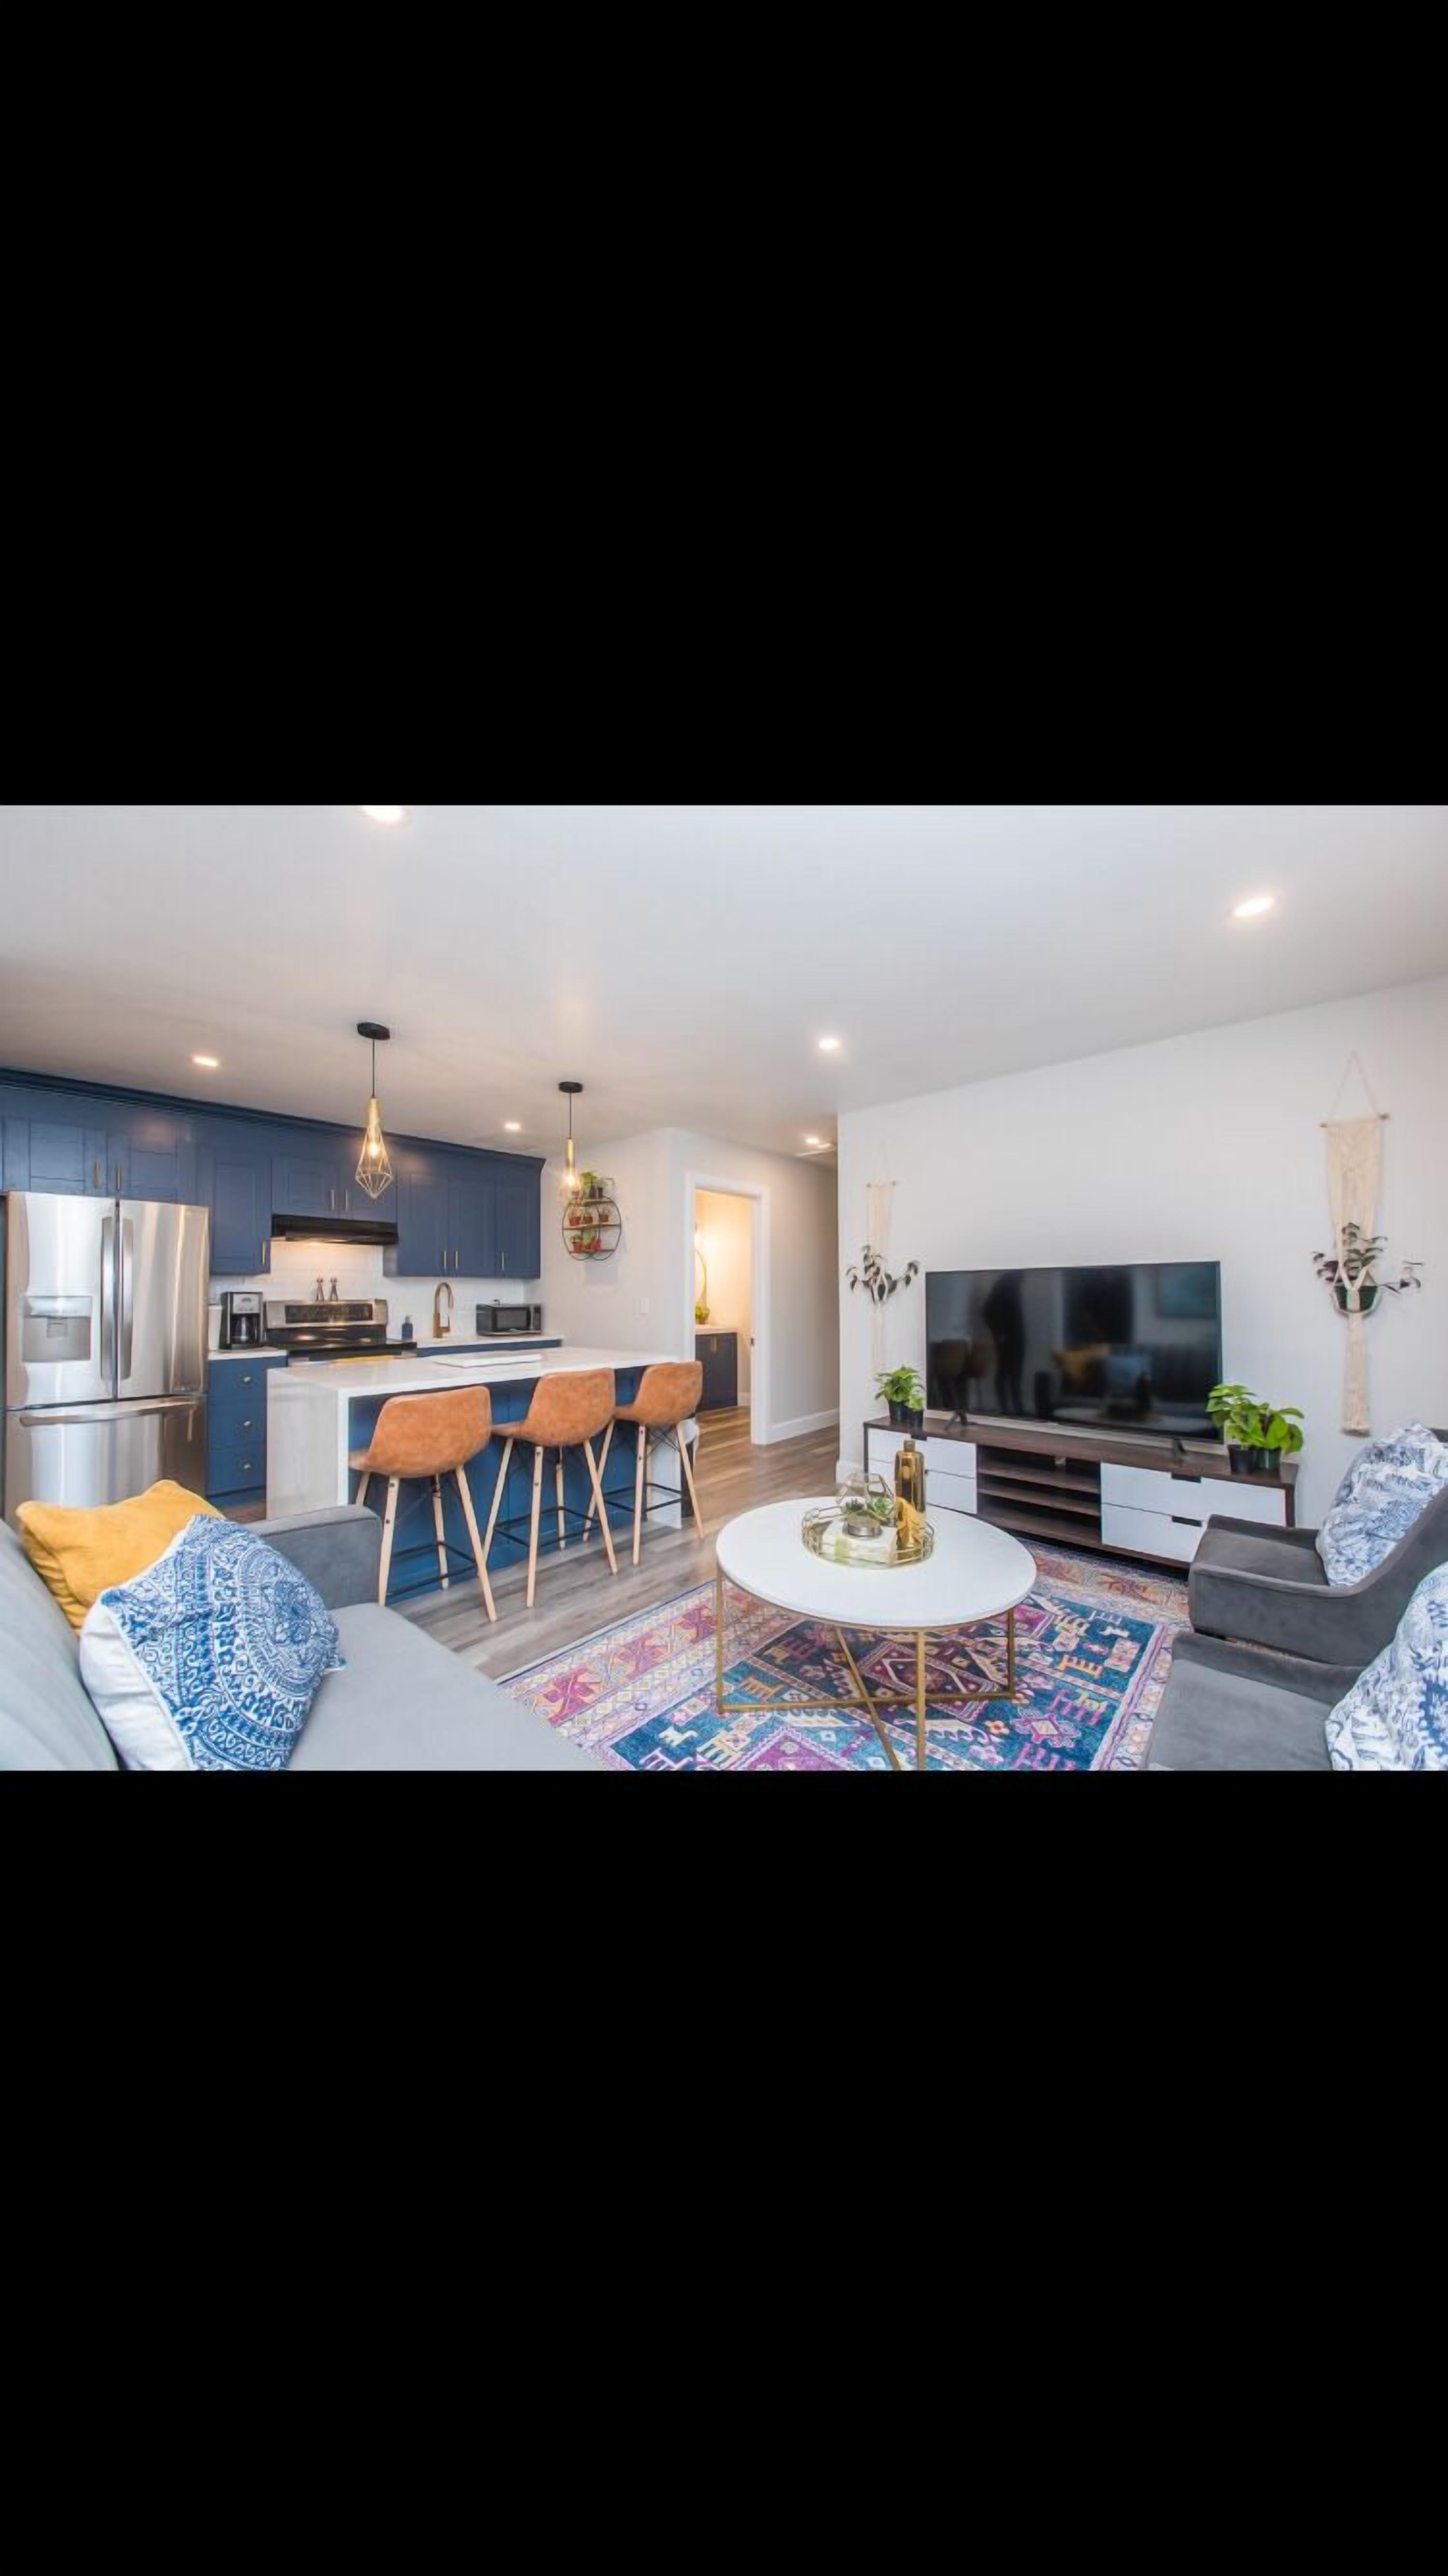 The Blue Lounge A Boho Chic Retreat In Downtown Ottawa Precos Promocoes E Comentarios Expedia Com Br